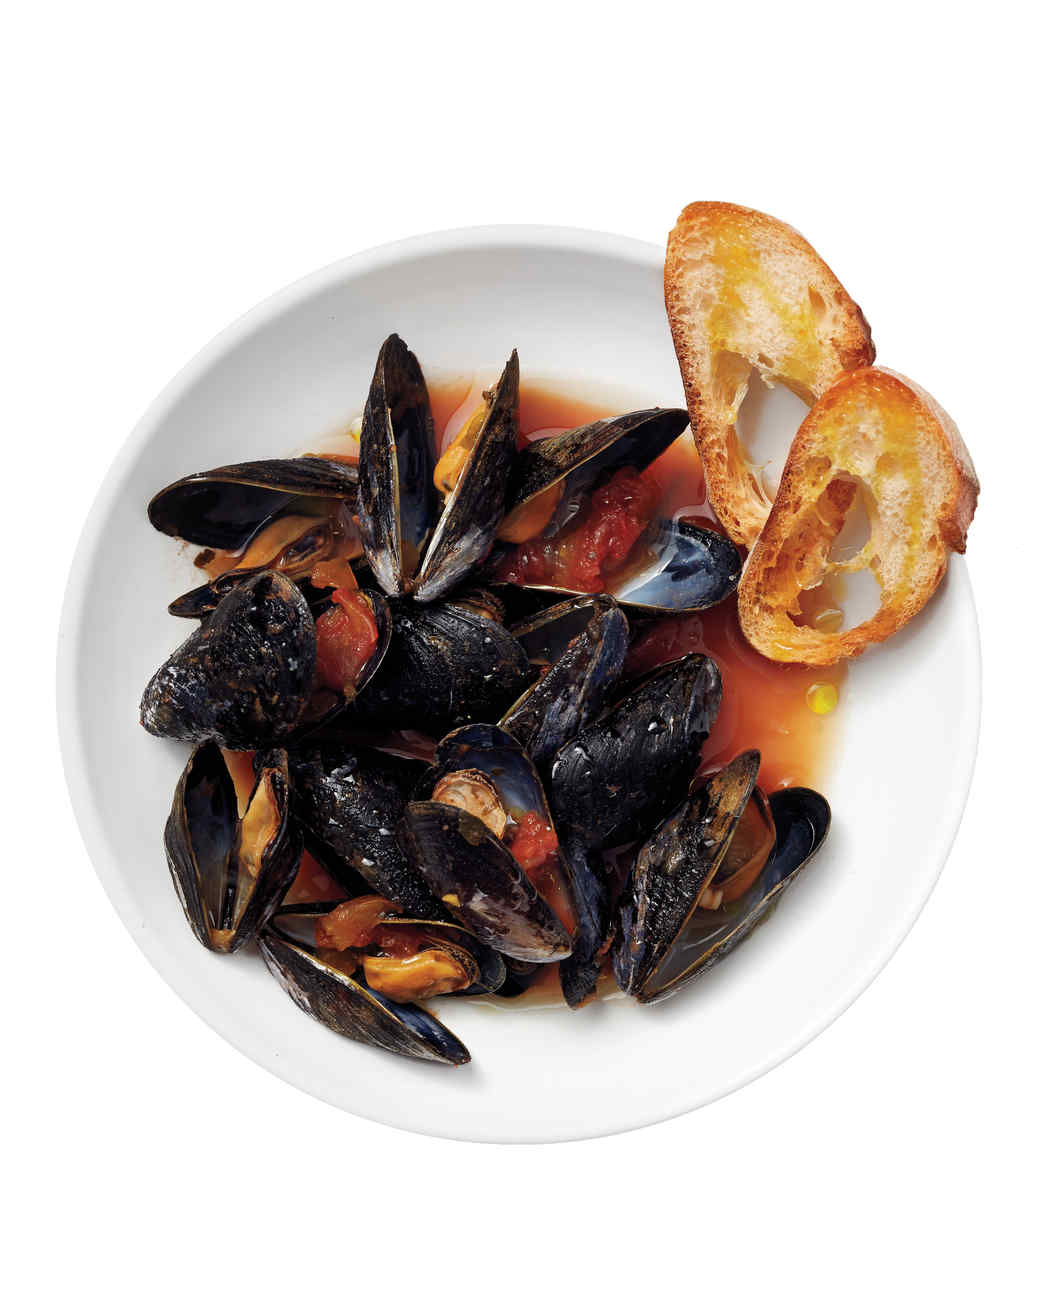 mussels-steamed-in-salsa-wine-0059-d112098.jpg